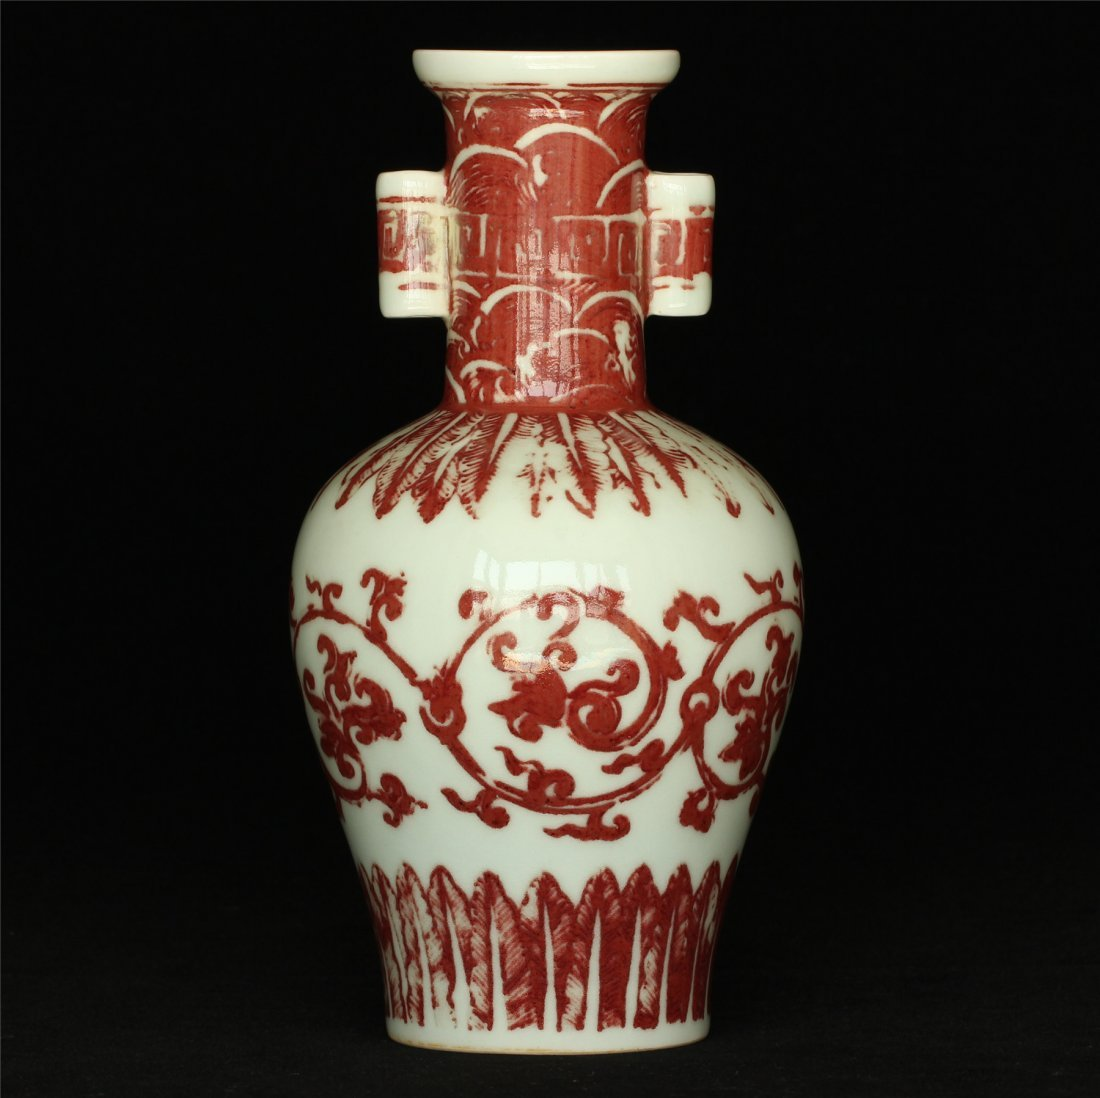 Underglaze red porcelain vase of Qing Dynasty QianLong